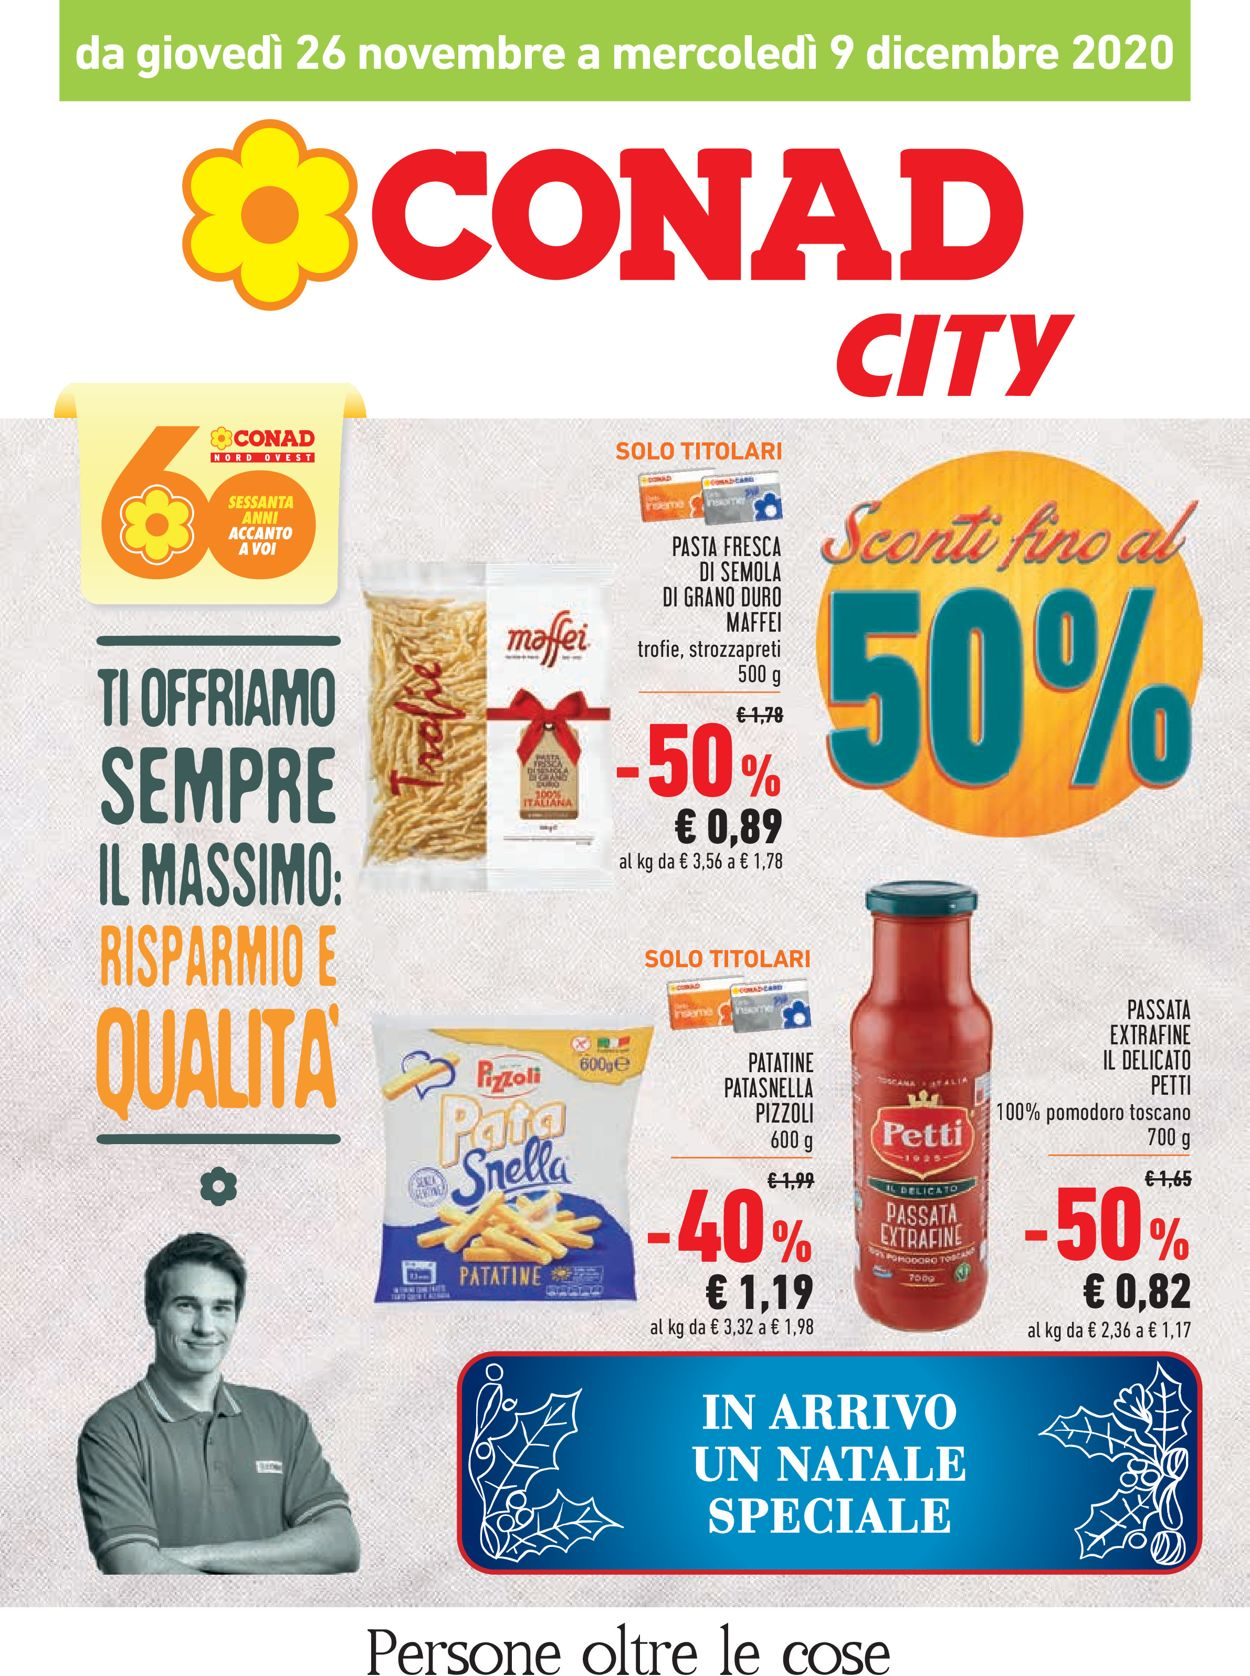 Volantino Conad - Black Friday 2020 - Offerte 26/11-09/12/2020